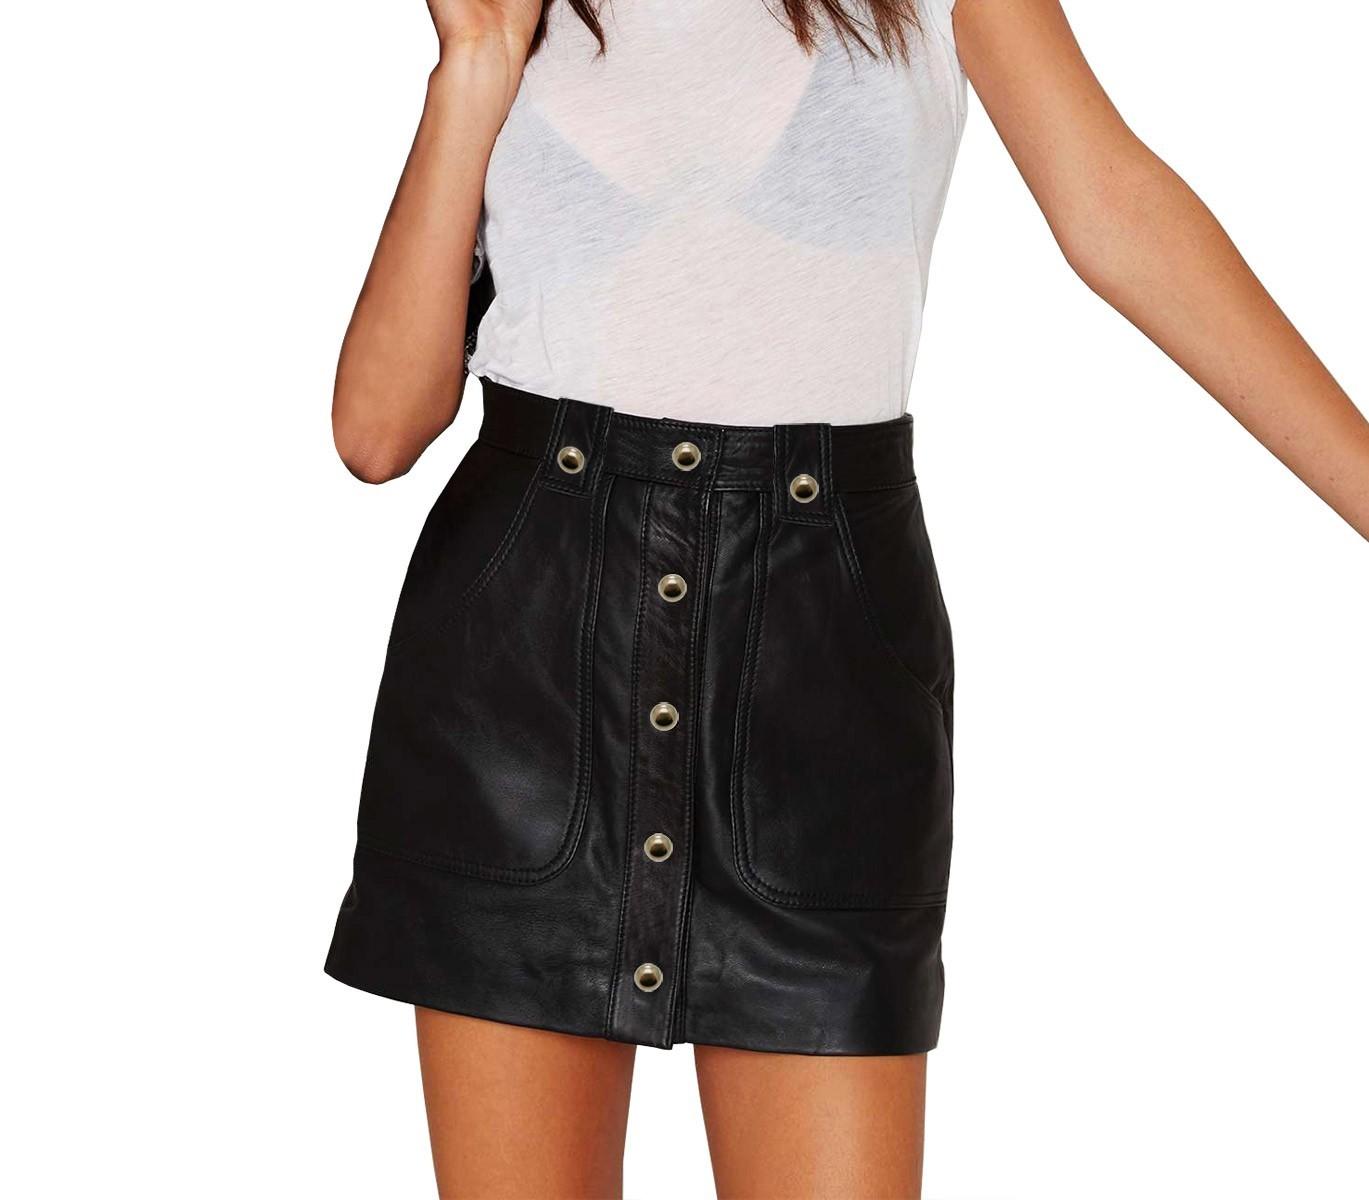 5176c83bb Faldas y minifaldas